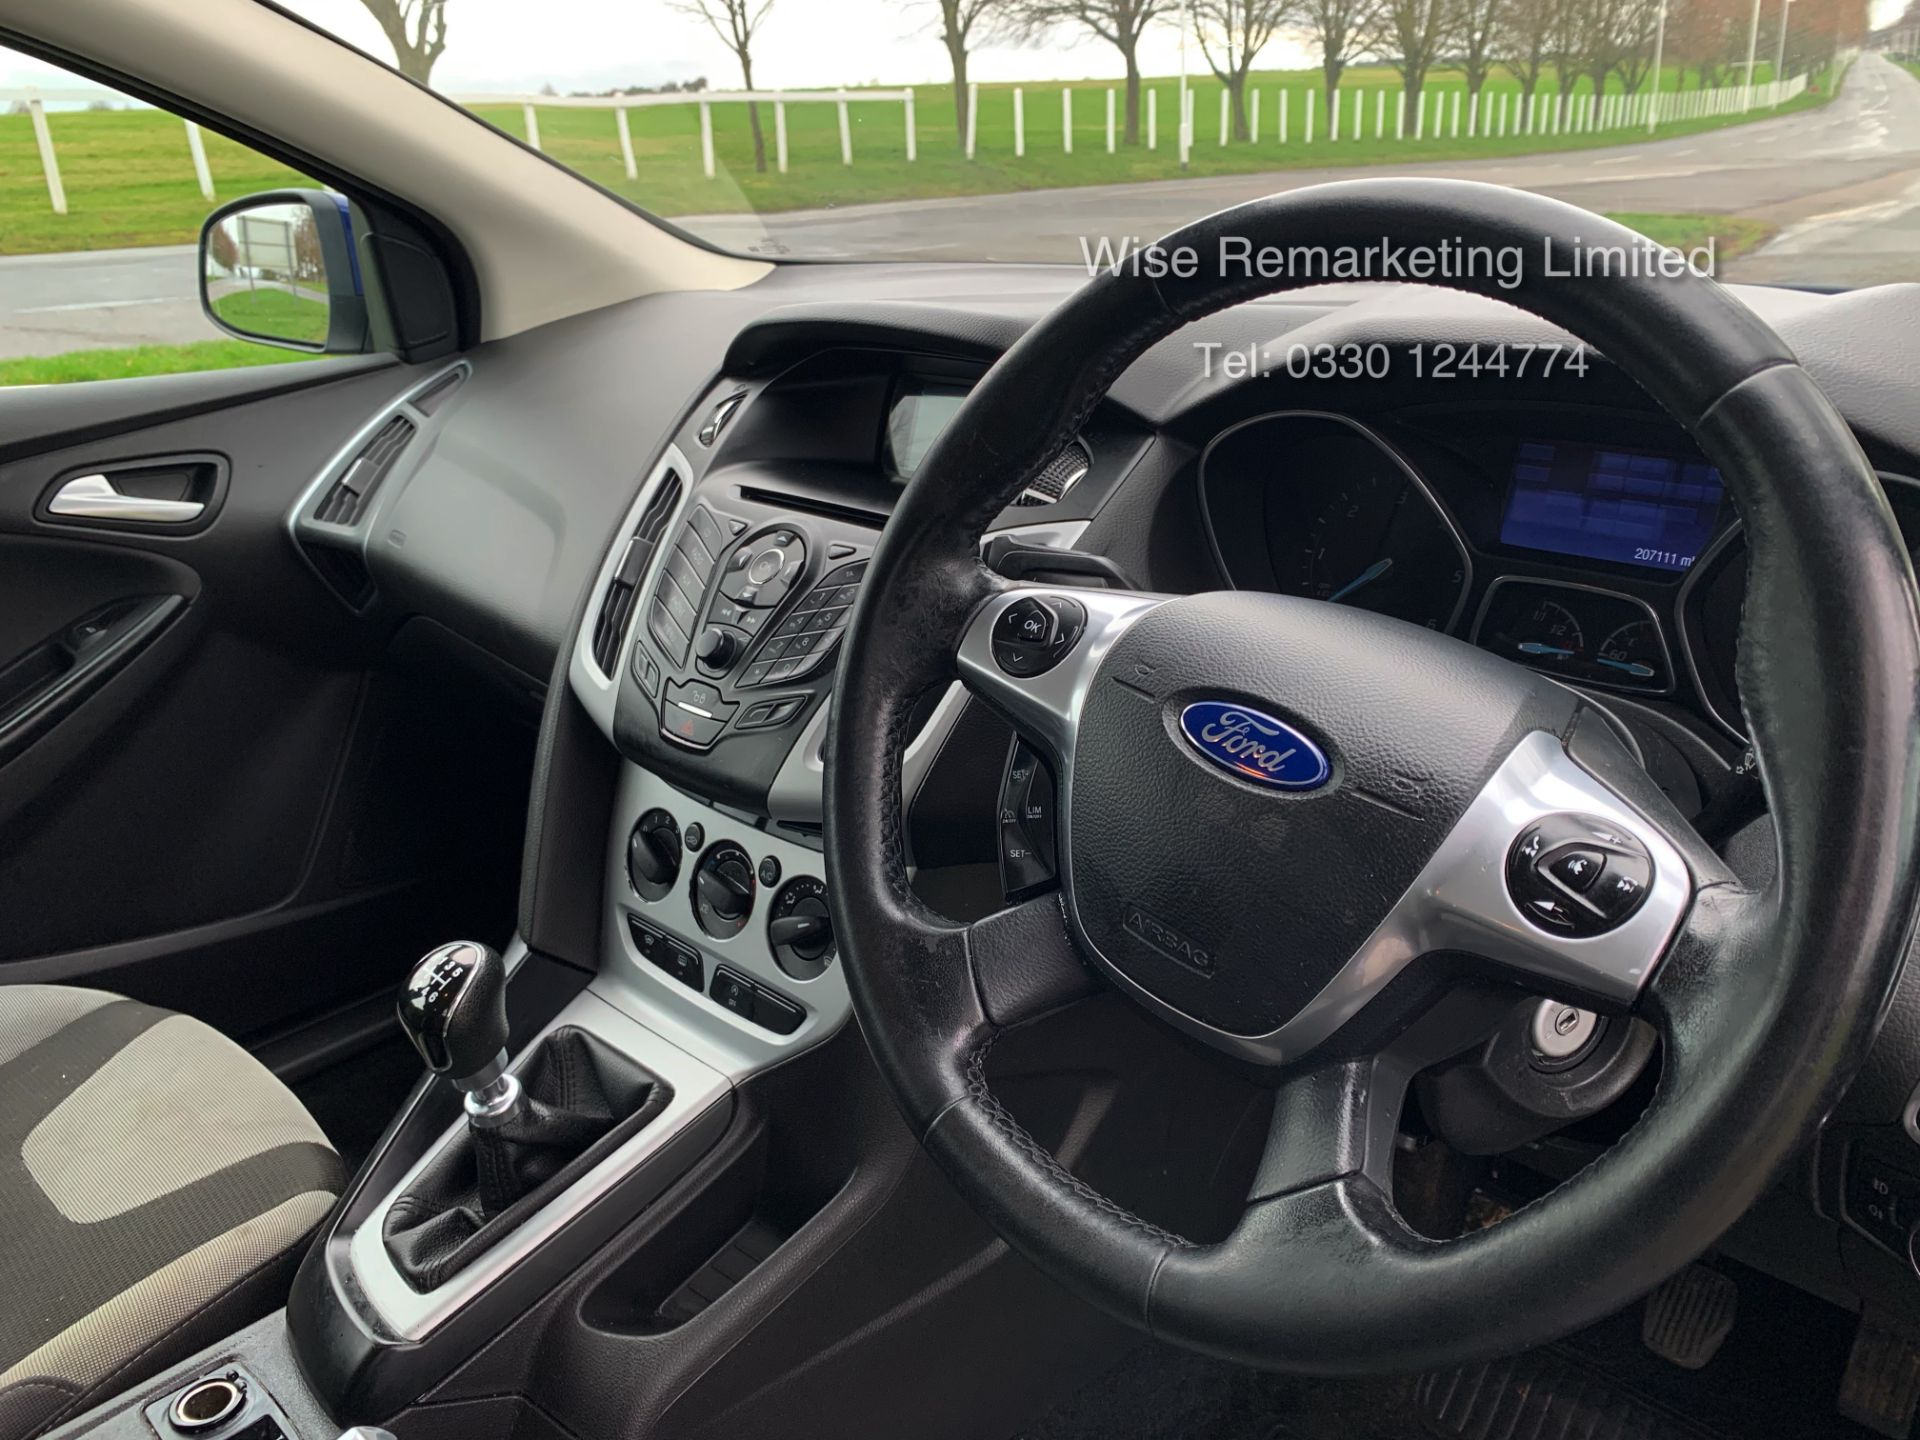 Ford Focus Zetec 1.6 TDCI Econetic - 2015 Model - 6 Speed - - Image 16 of 20